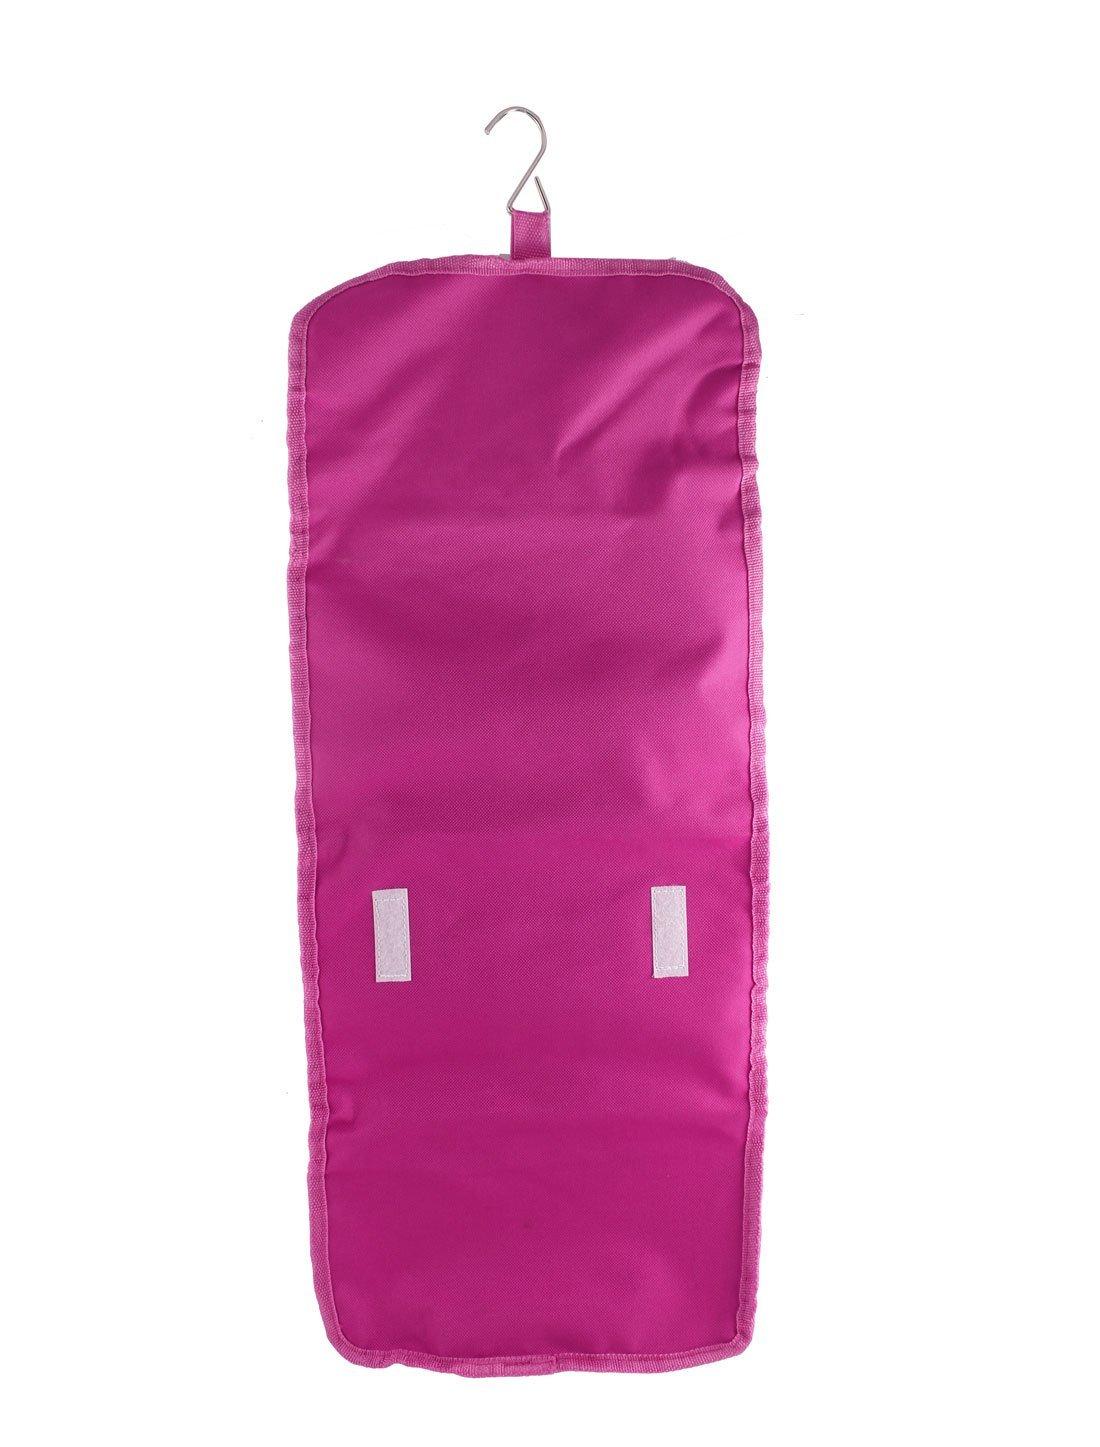 Amazon.com: Maquillaje eDealMax de Nylon Bolsa de la caja cosmética de almacenamiento Organizador Neceser Rosa: Health & Personal Care